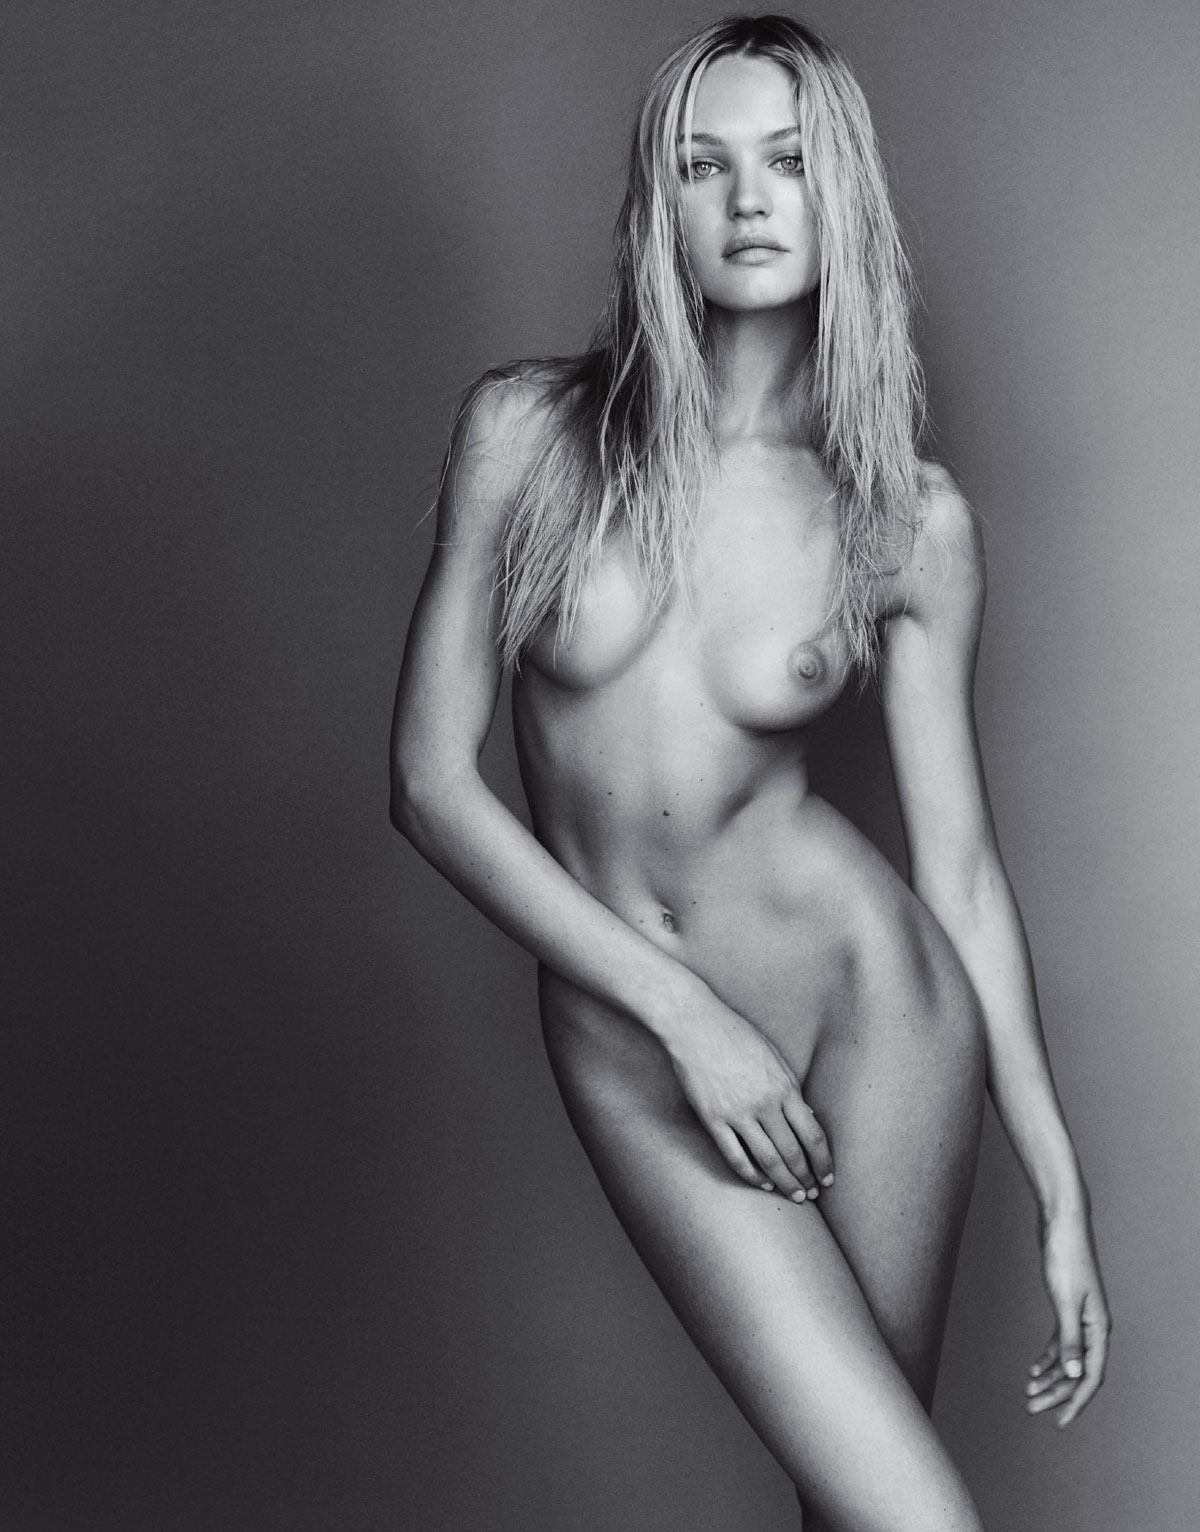 girls naked secret Victoria